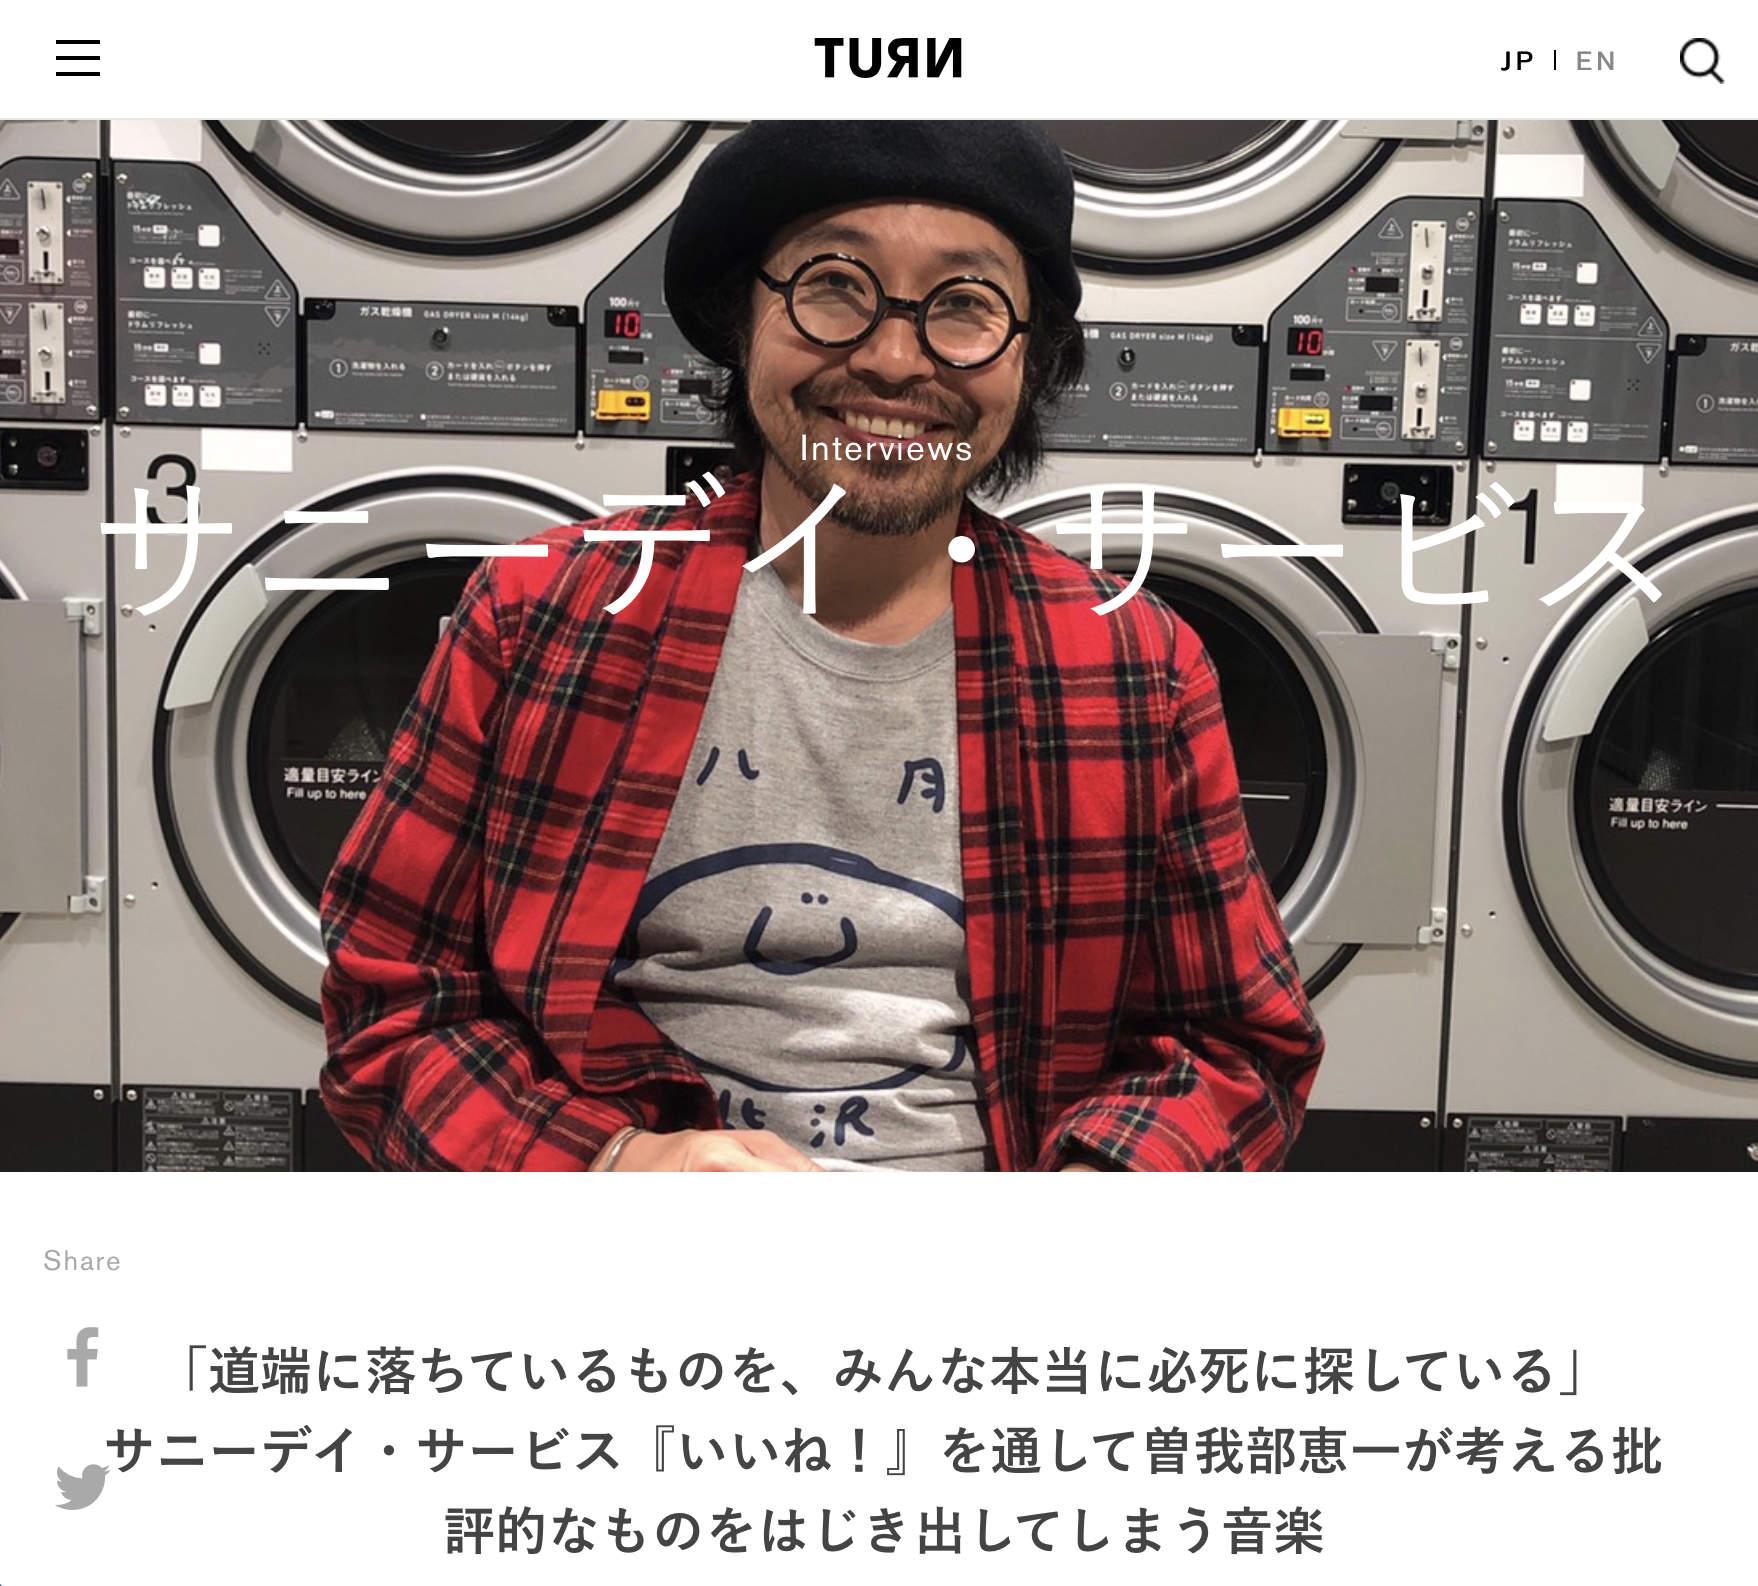 http://rose-records.jp/files/20200617123248.jpg